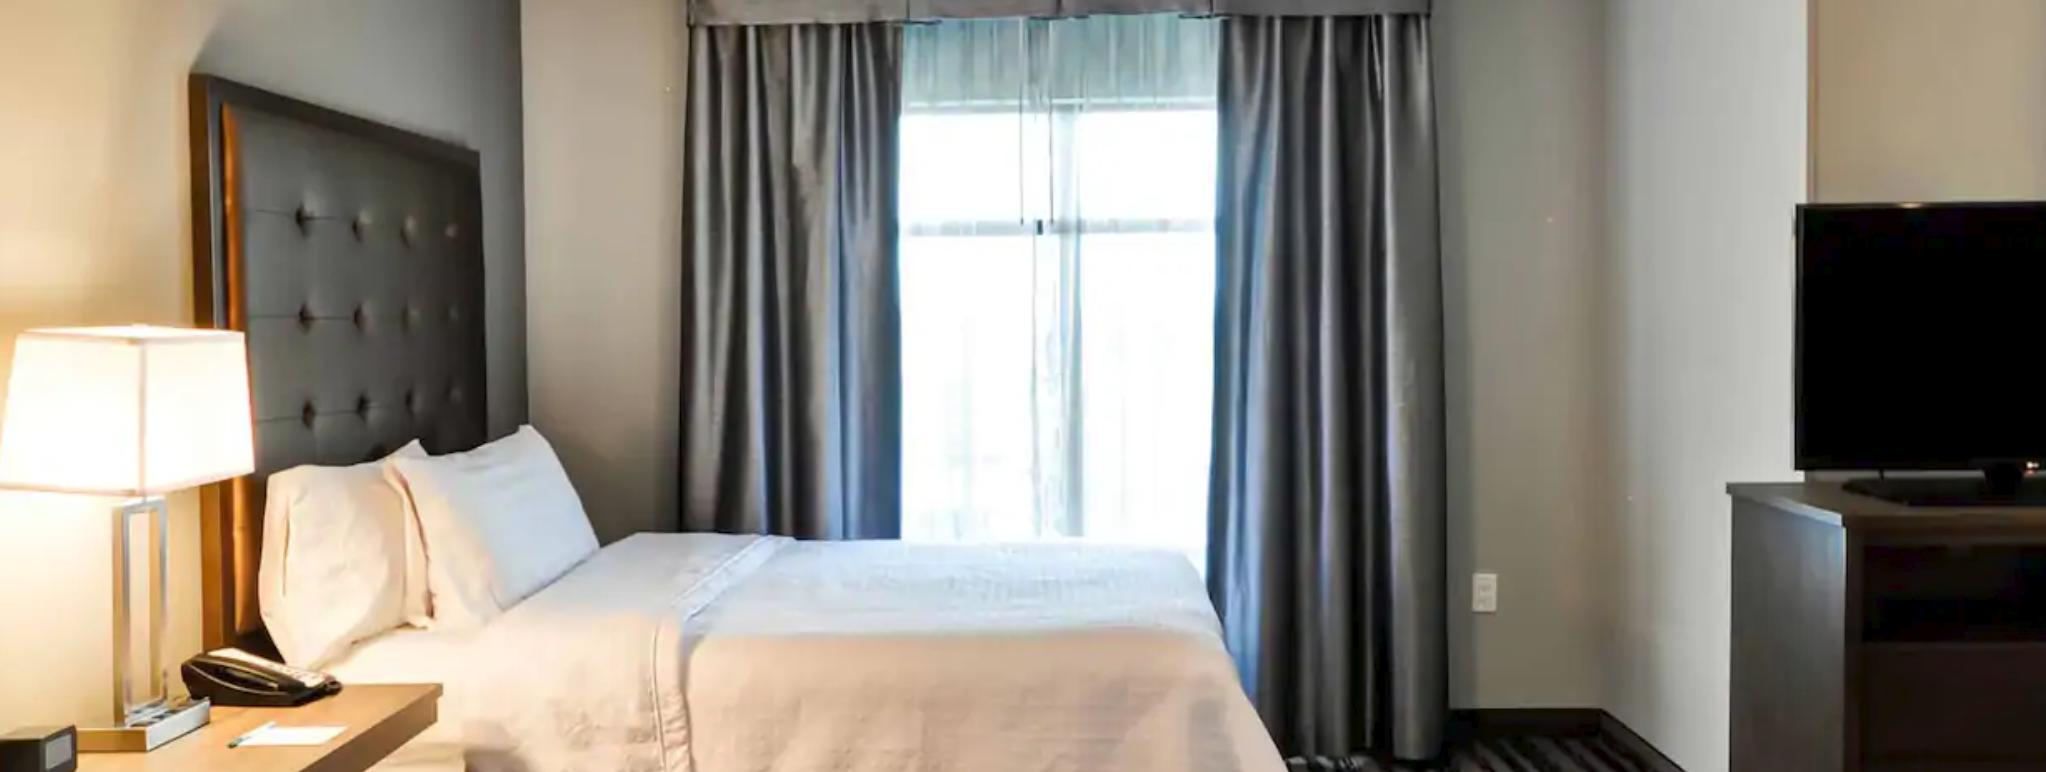 https://www.hotelsbyday.com/_data/default-hotel_image/3/19969/screenshot-2020-08-01-at-7-37-54-am.png